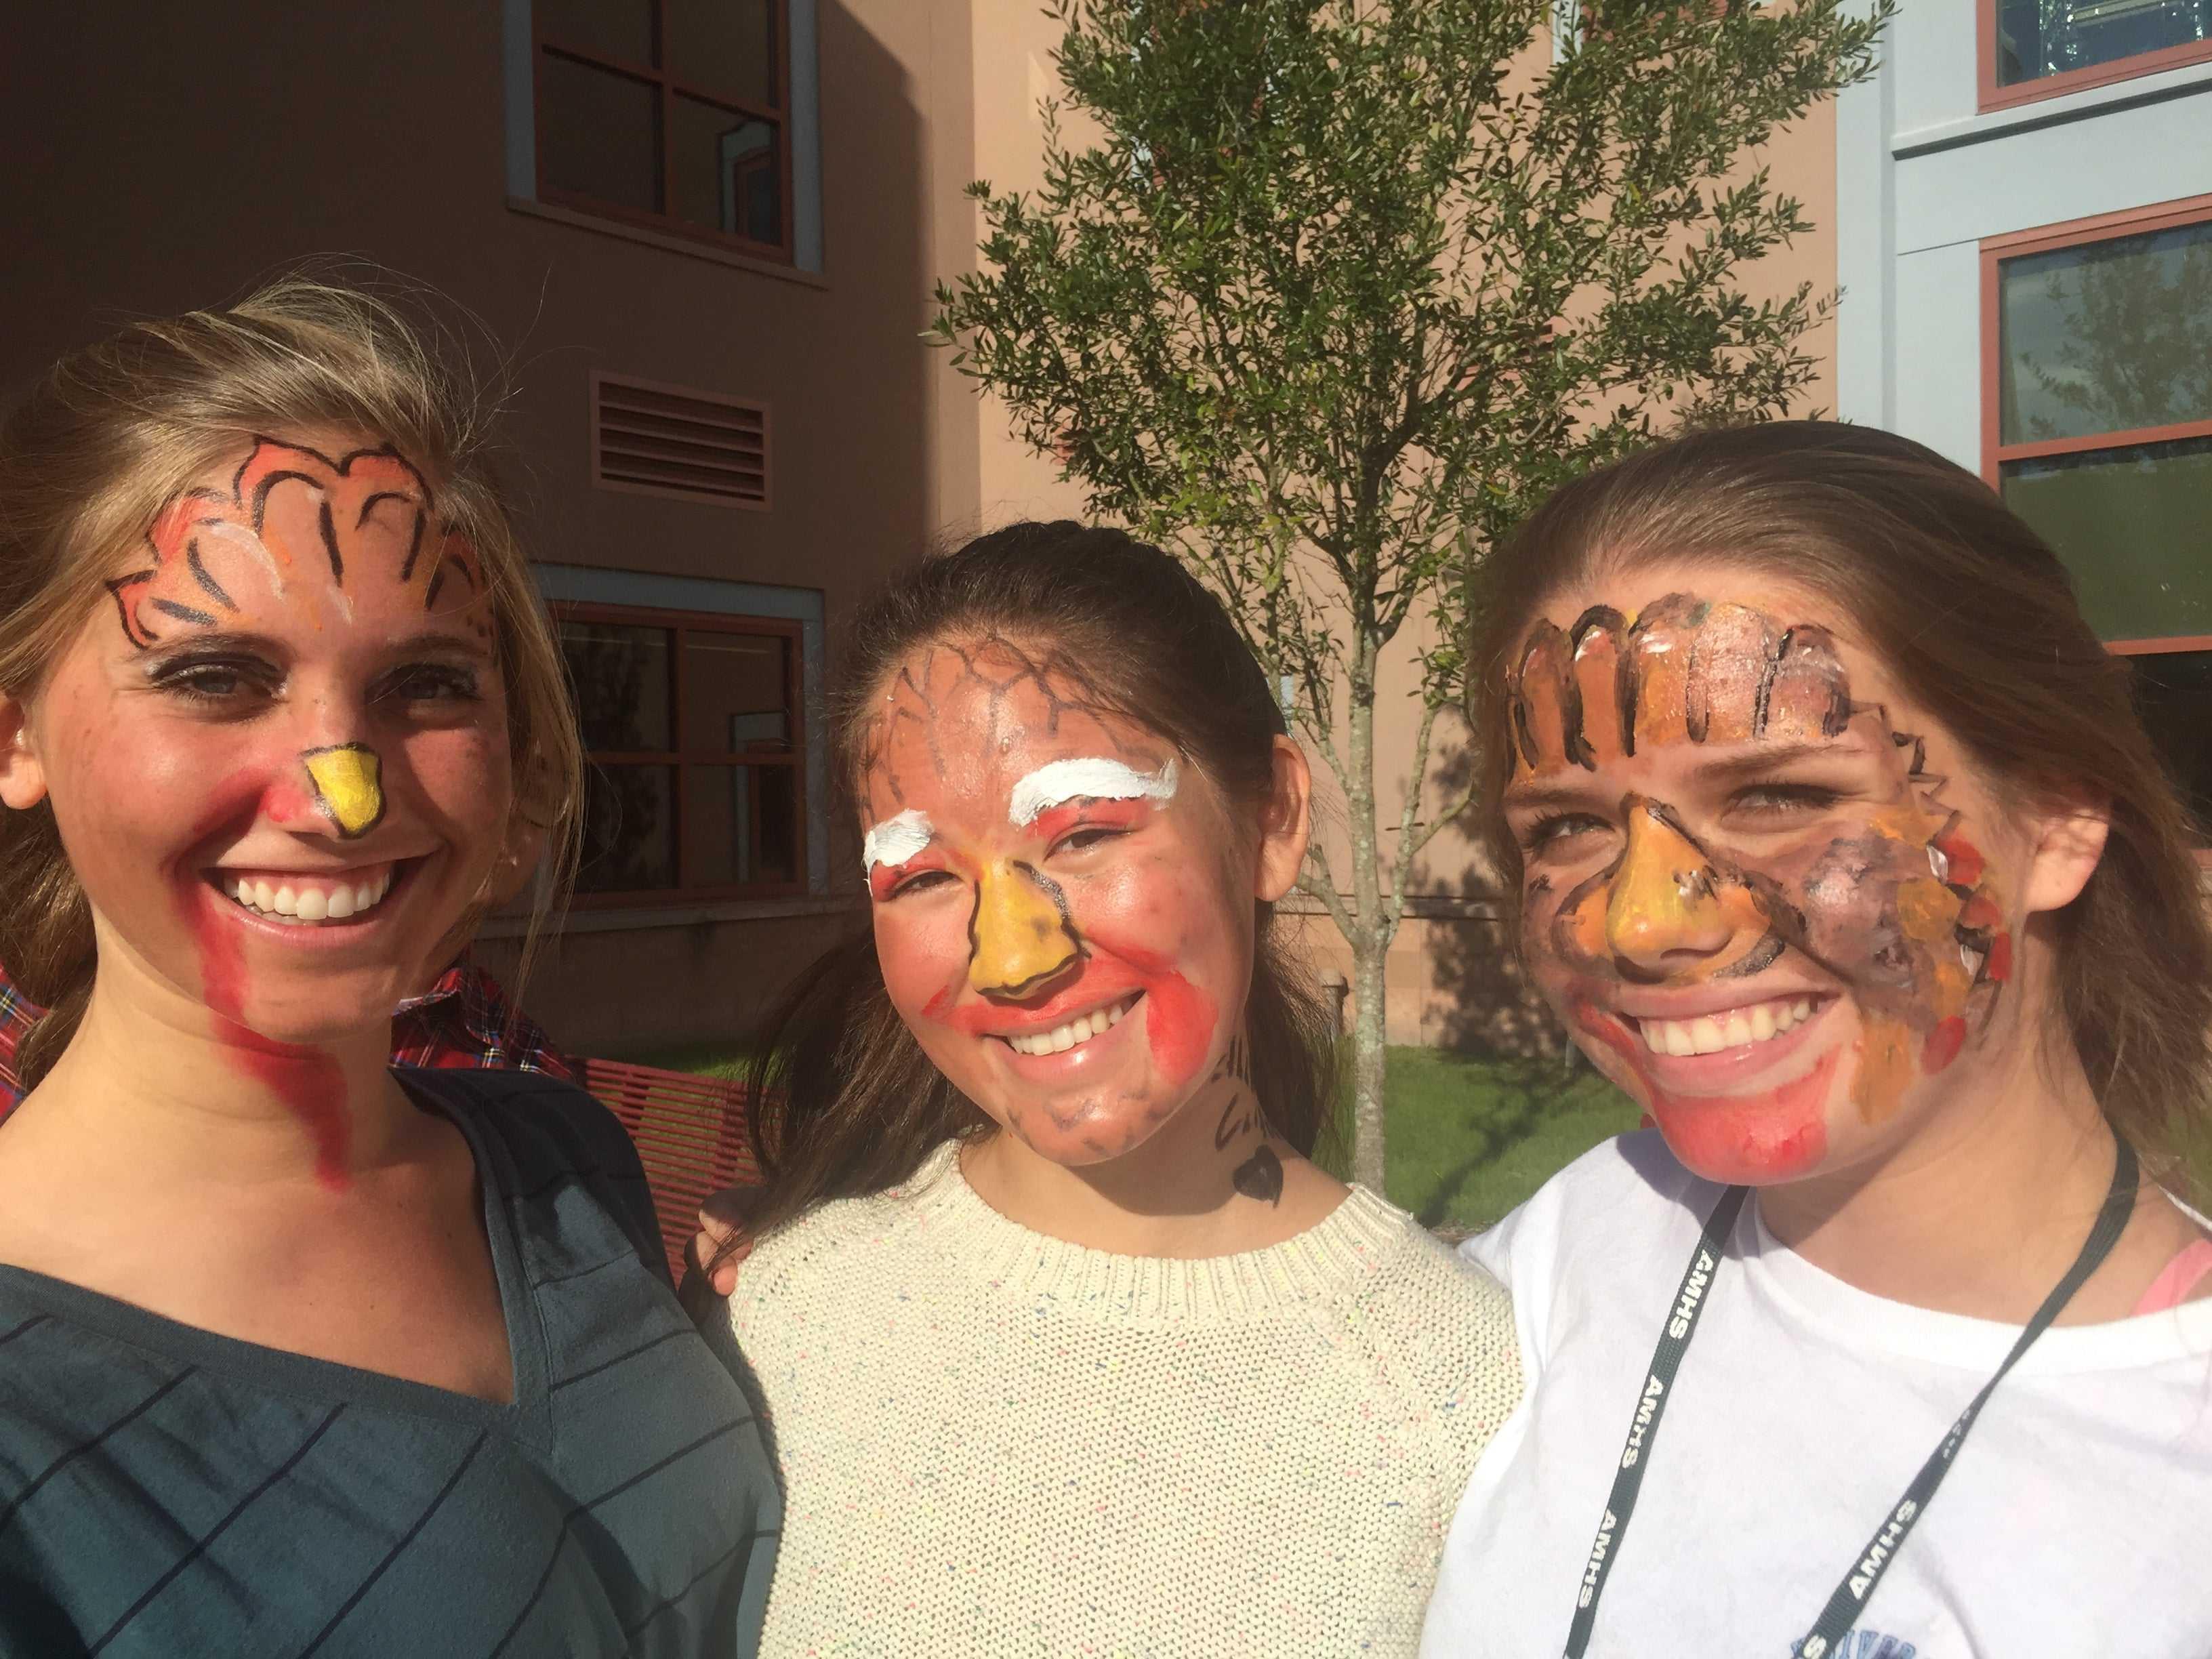 Contestants Hallie Roerden, Mika Sakamoto, and Amber Thomas show off their Turkey Faces